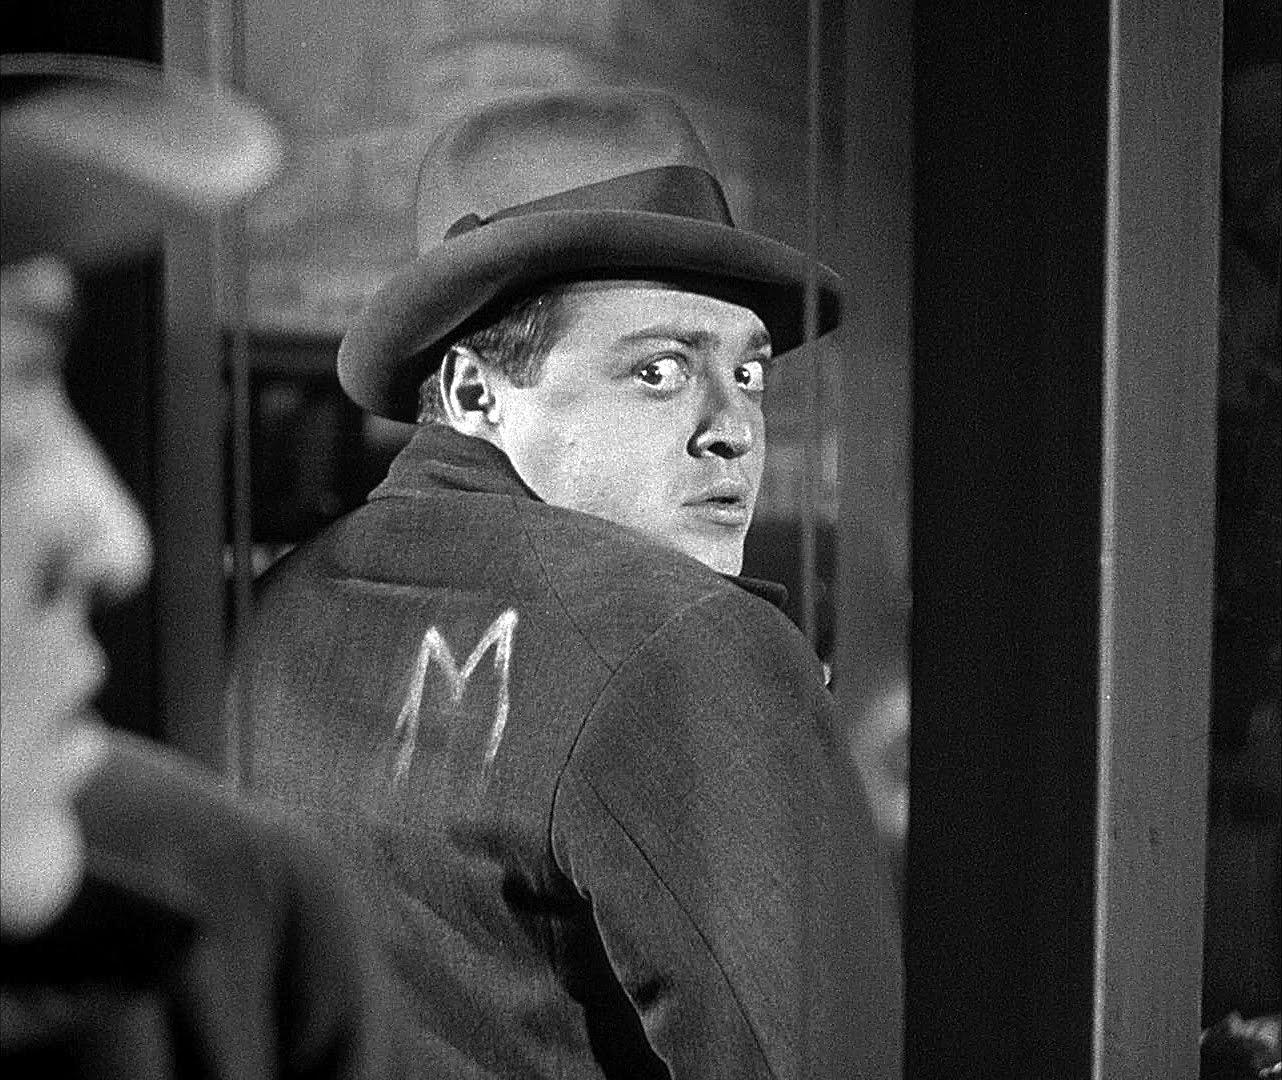 Hans Beckert (Peter Lorre) in Fritz Lang's 1931 crime thriller  M .